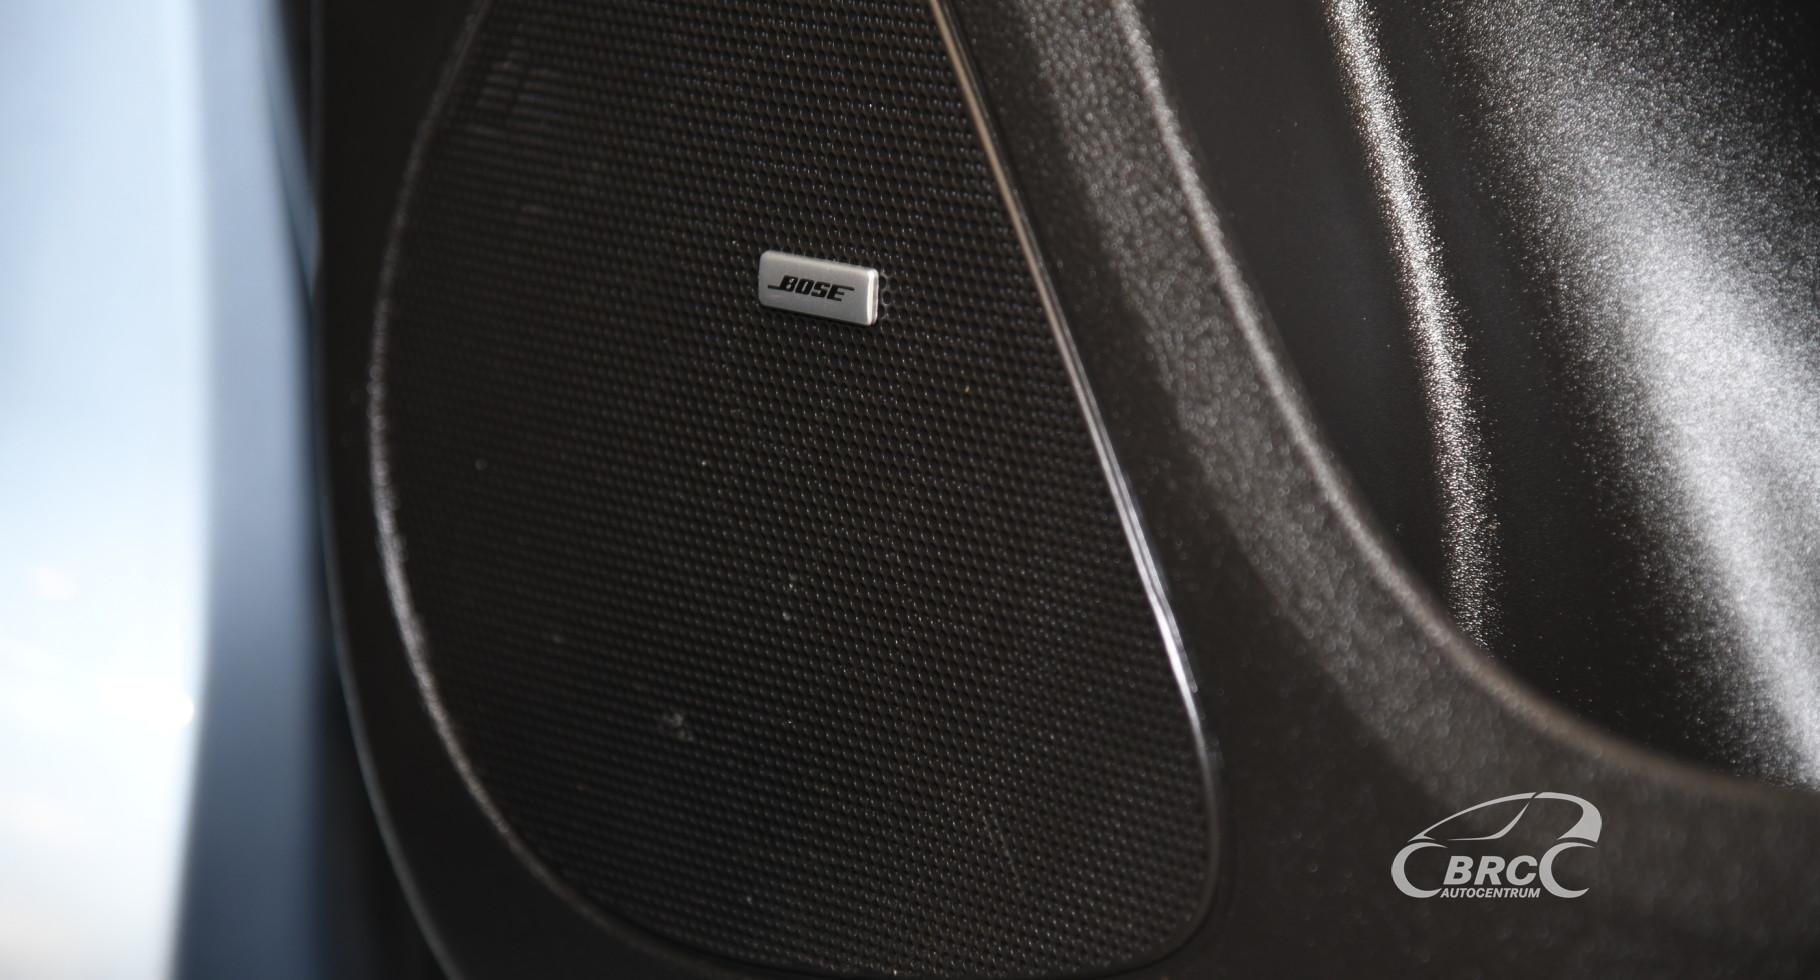 Chevrolet Volt 1.4 Plug-In Hybrid Automatas